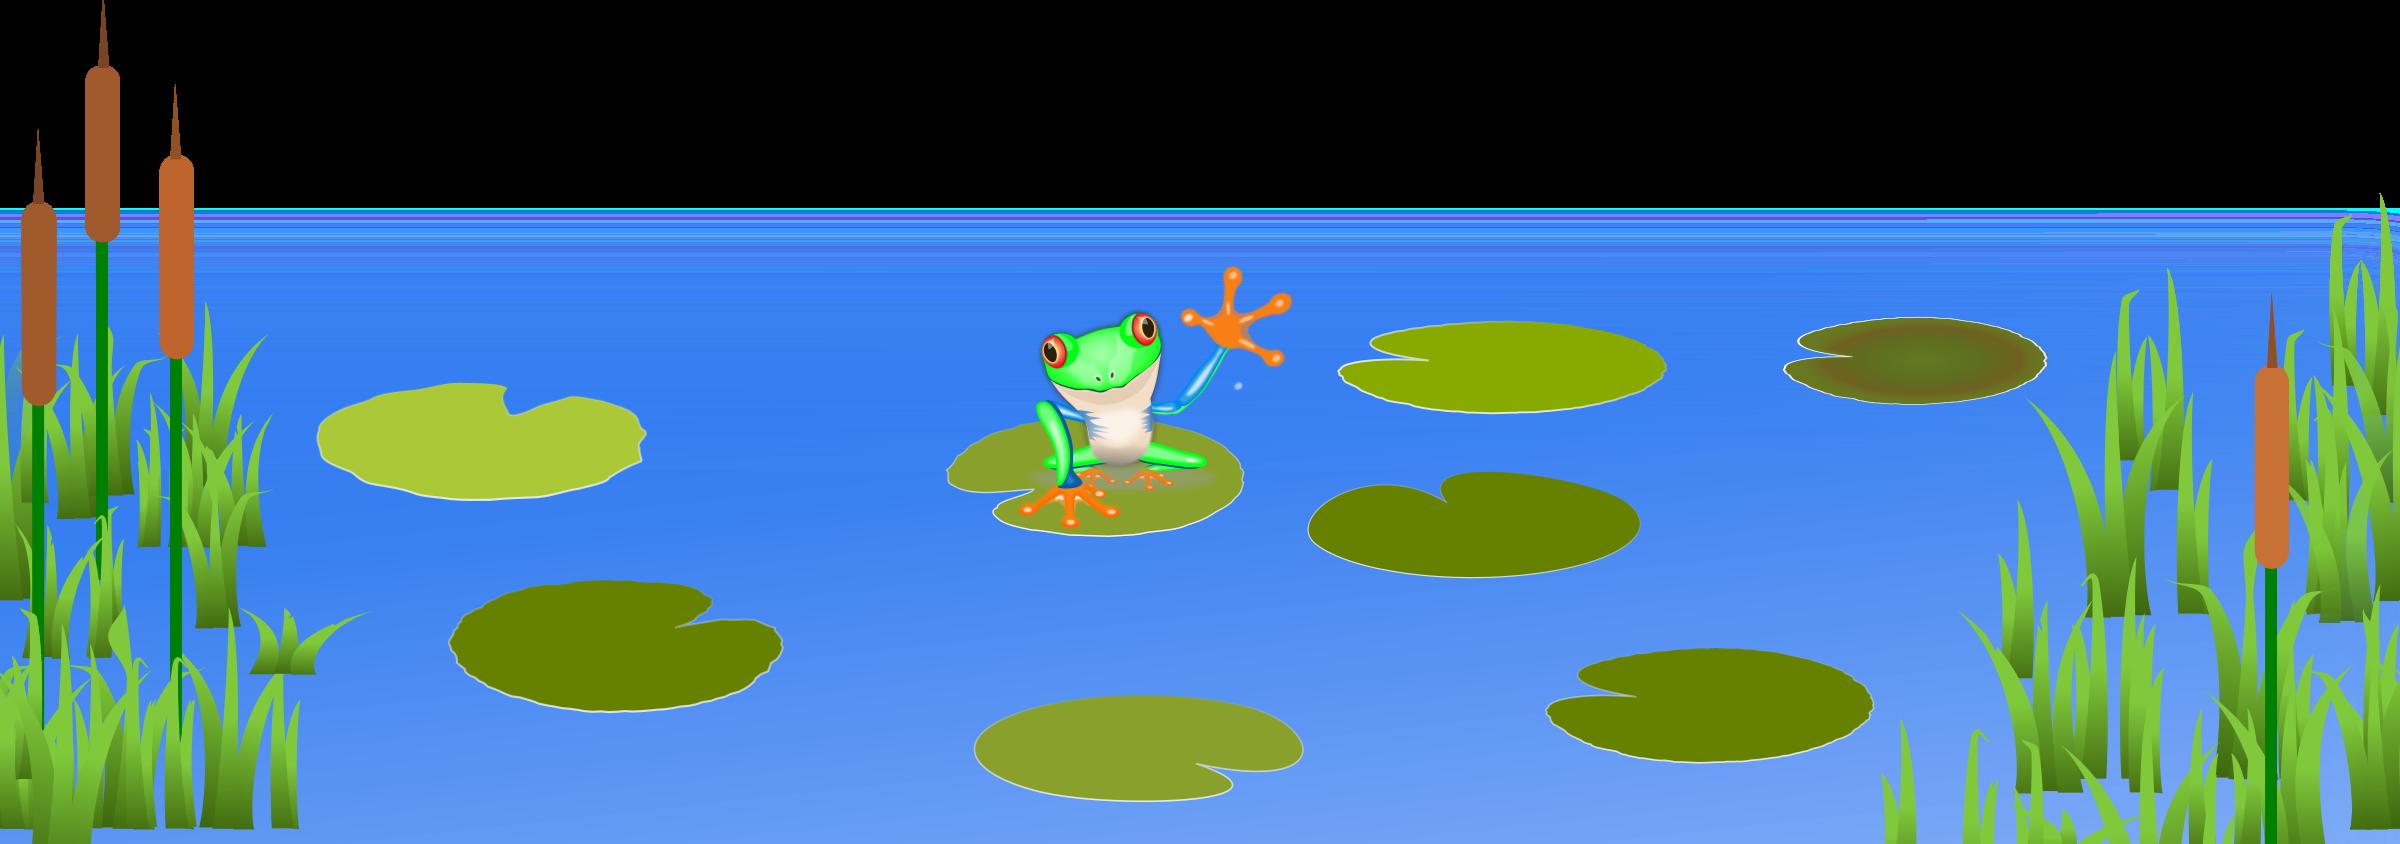 Garden clipart habitat. Lily pad pond scene